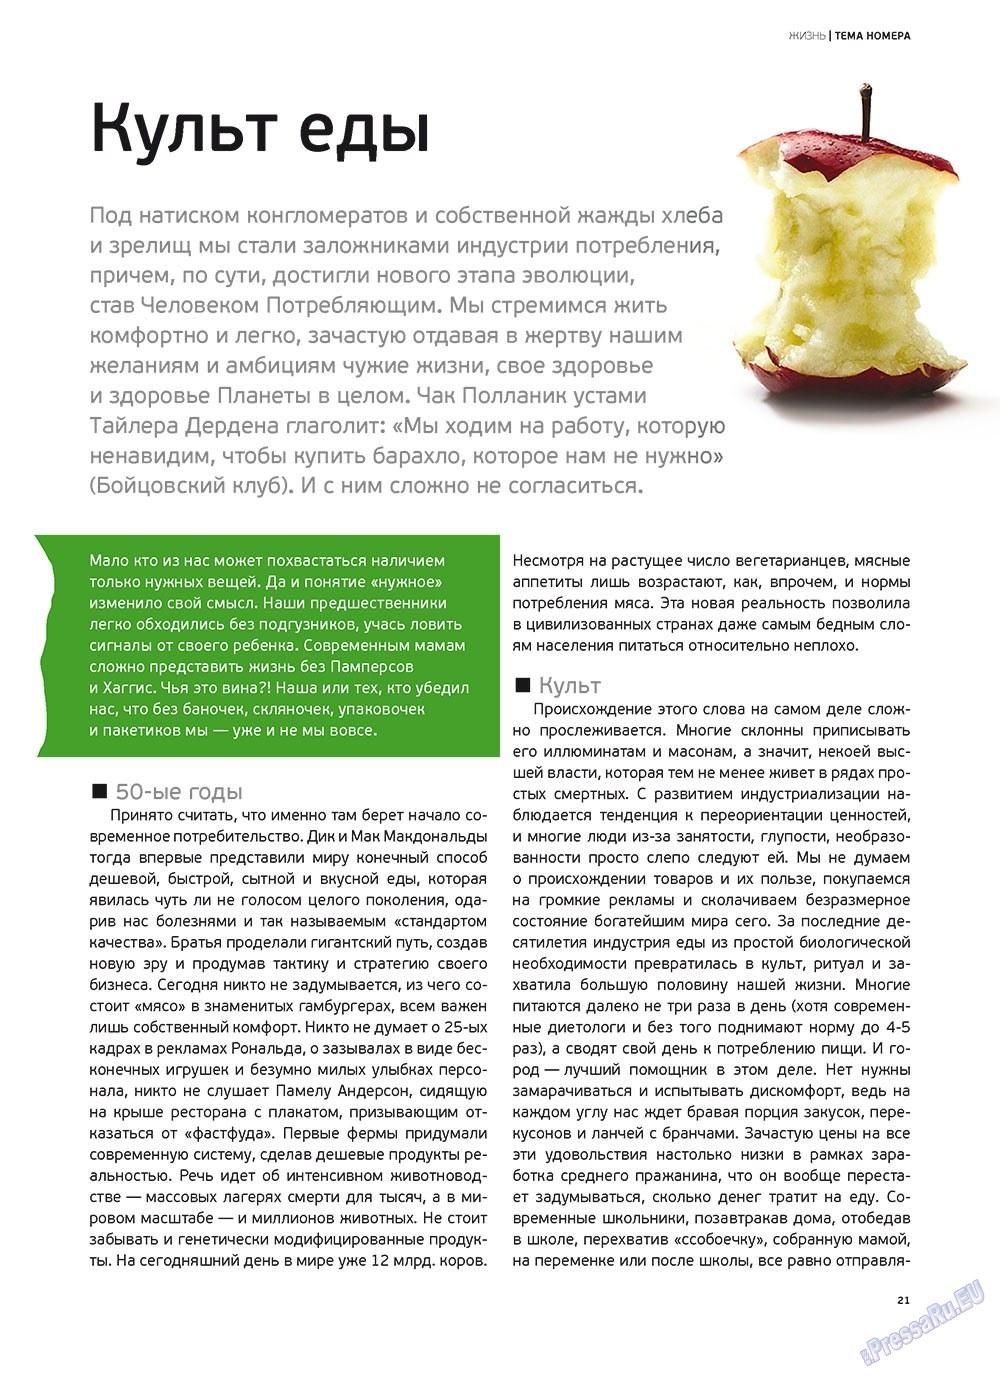 Артек (журнал). 2011 год, номер 4, стр. 23